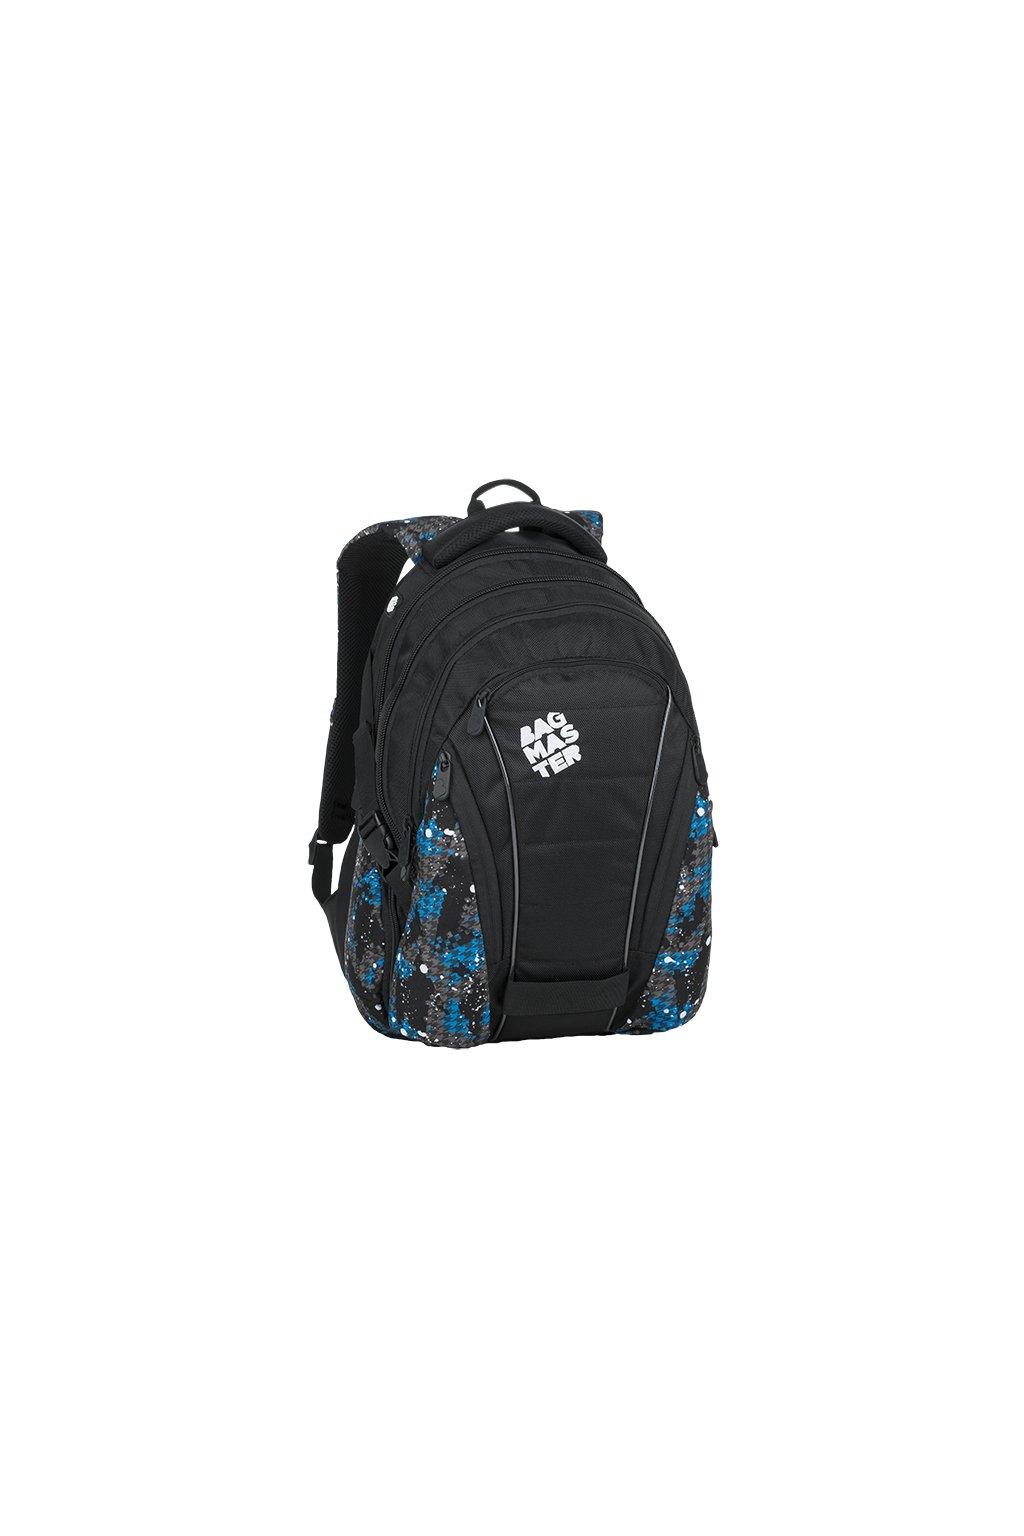 BAG 9D BLUE GRAY BLACK 1 kopie